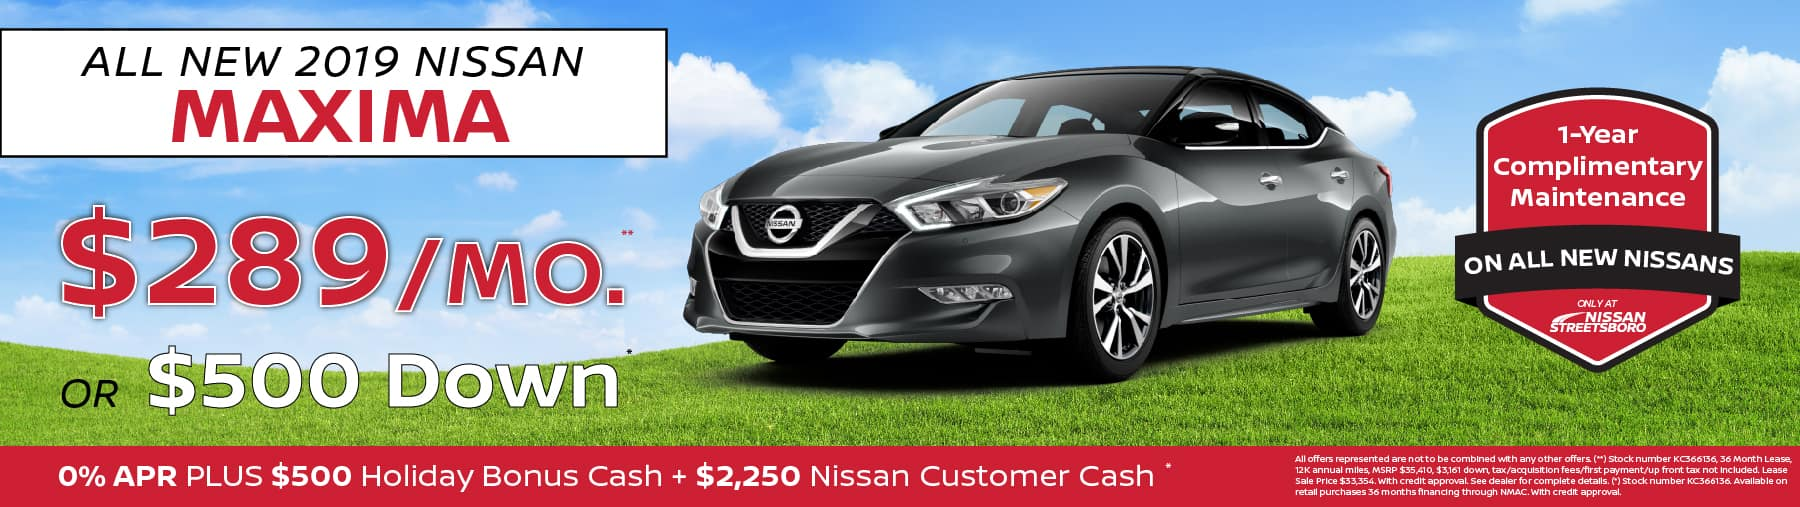 Nissan Maxima Special Ohio